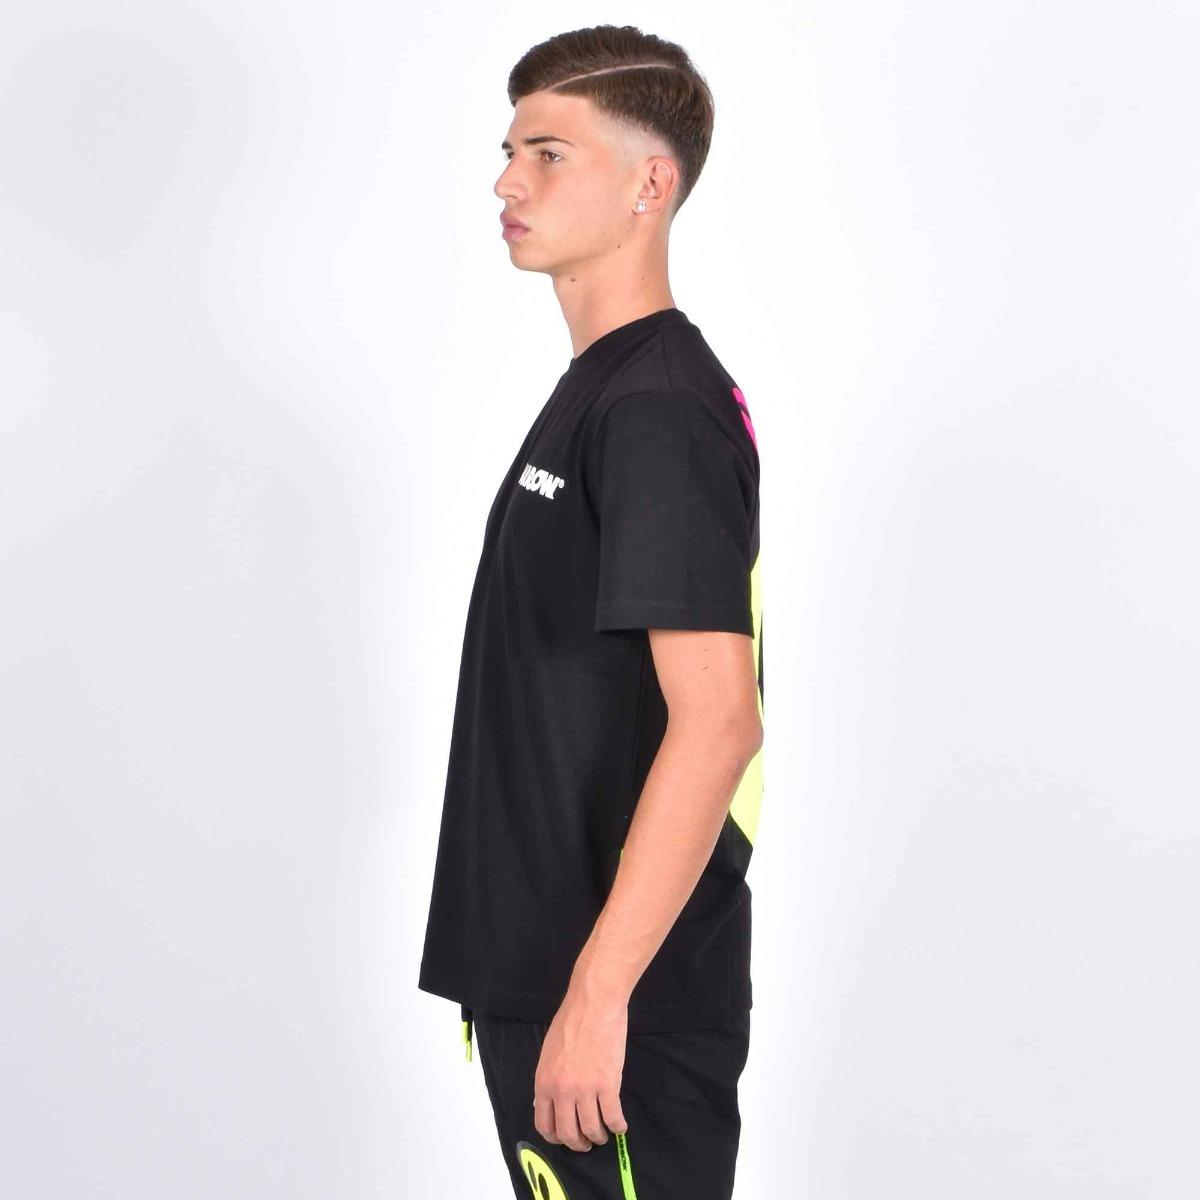 T-shirt scritta flok - Nero